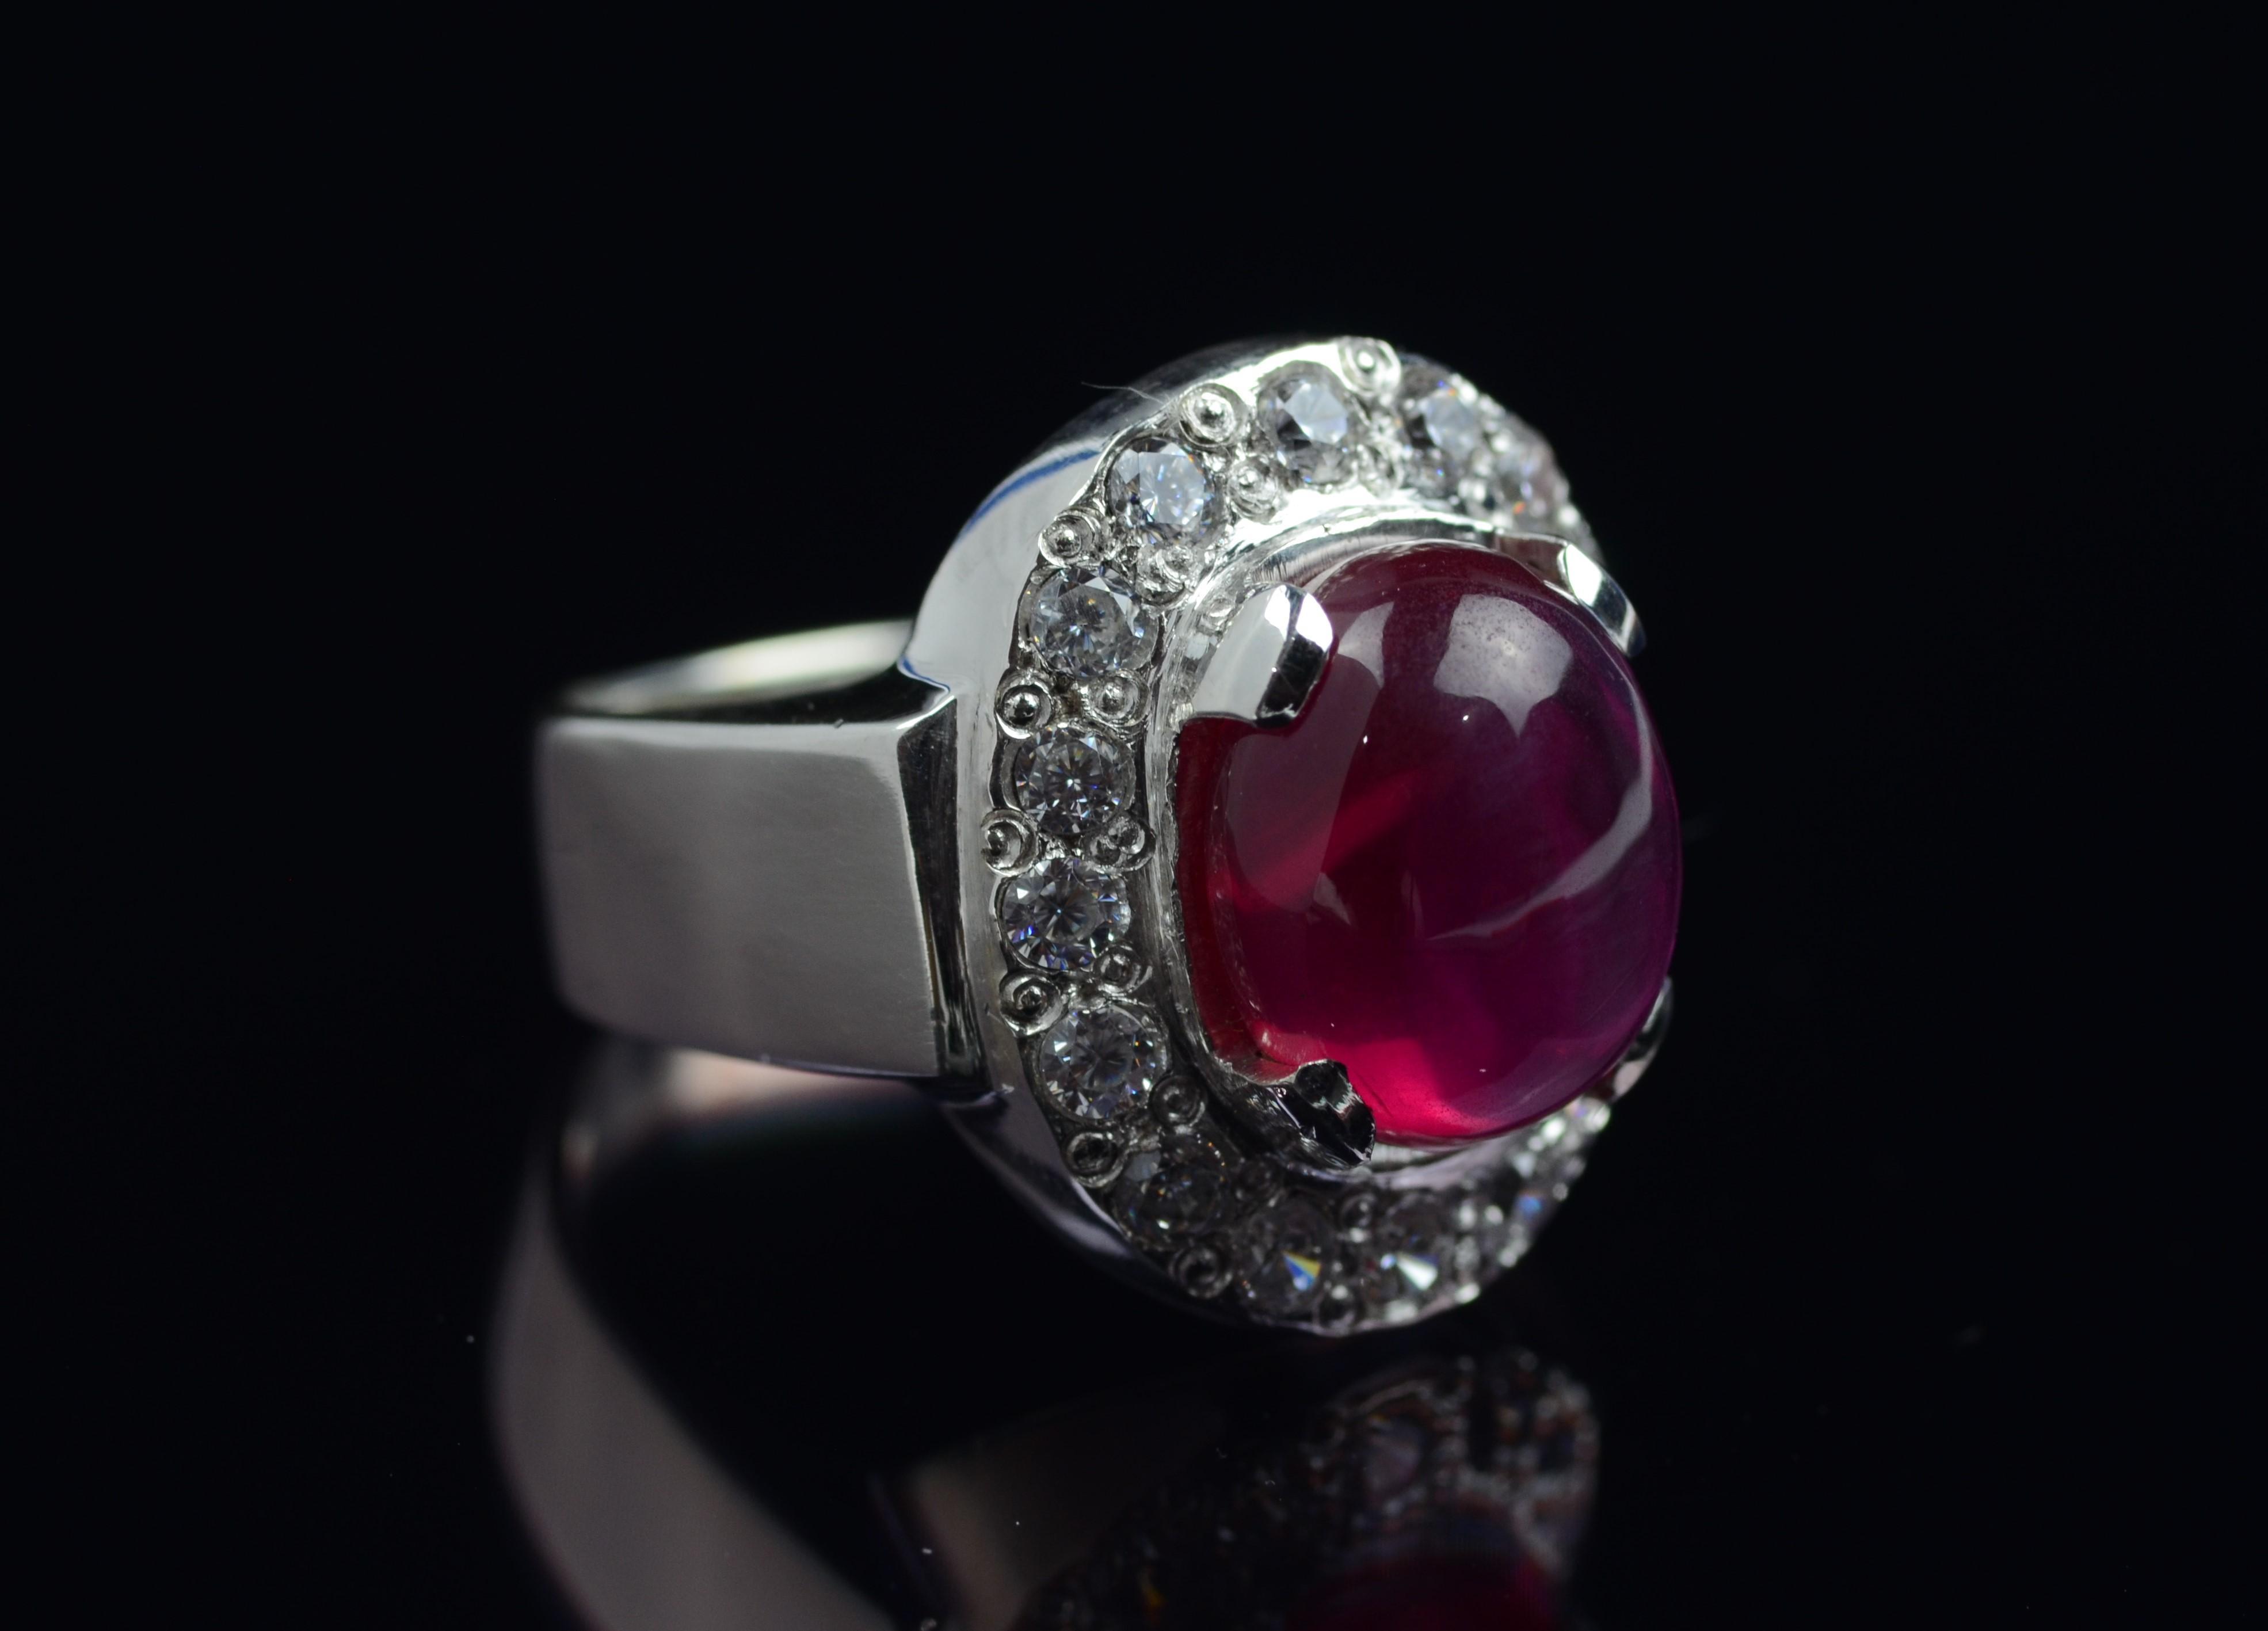 f93bfce699f Elegant Design Women Ruby Ring, Ruby Star Ring, Sterling Silver 925 Ring,  Yaqoot Ring, Ruby Pink Ring, Ruby Girls Ring, Handmade Ring